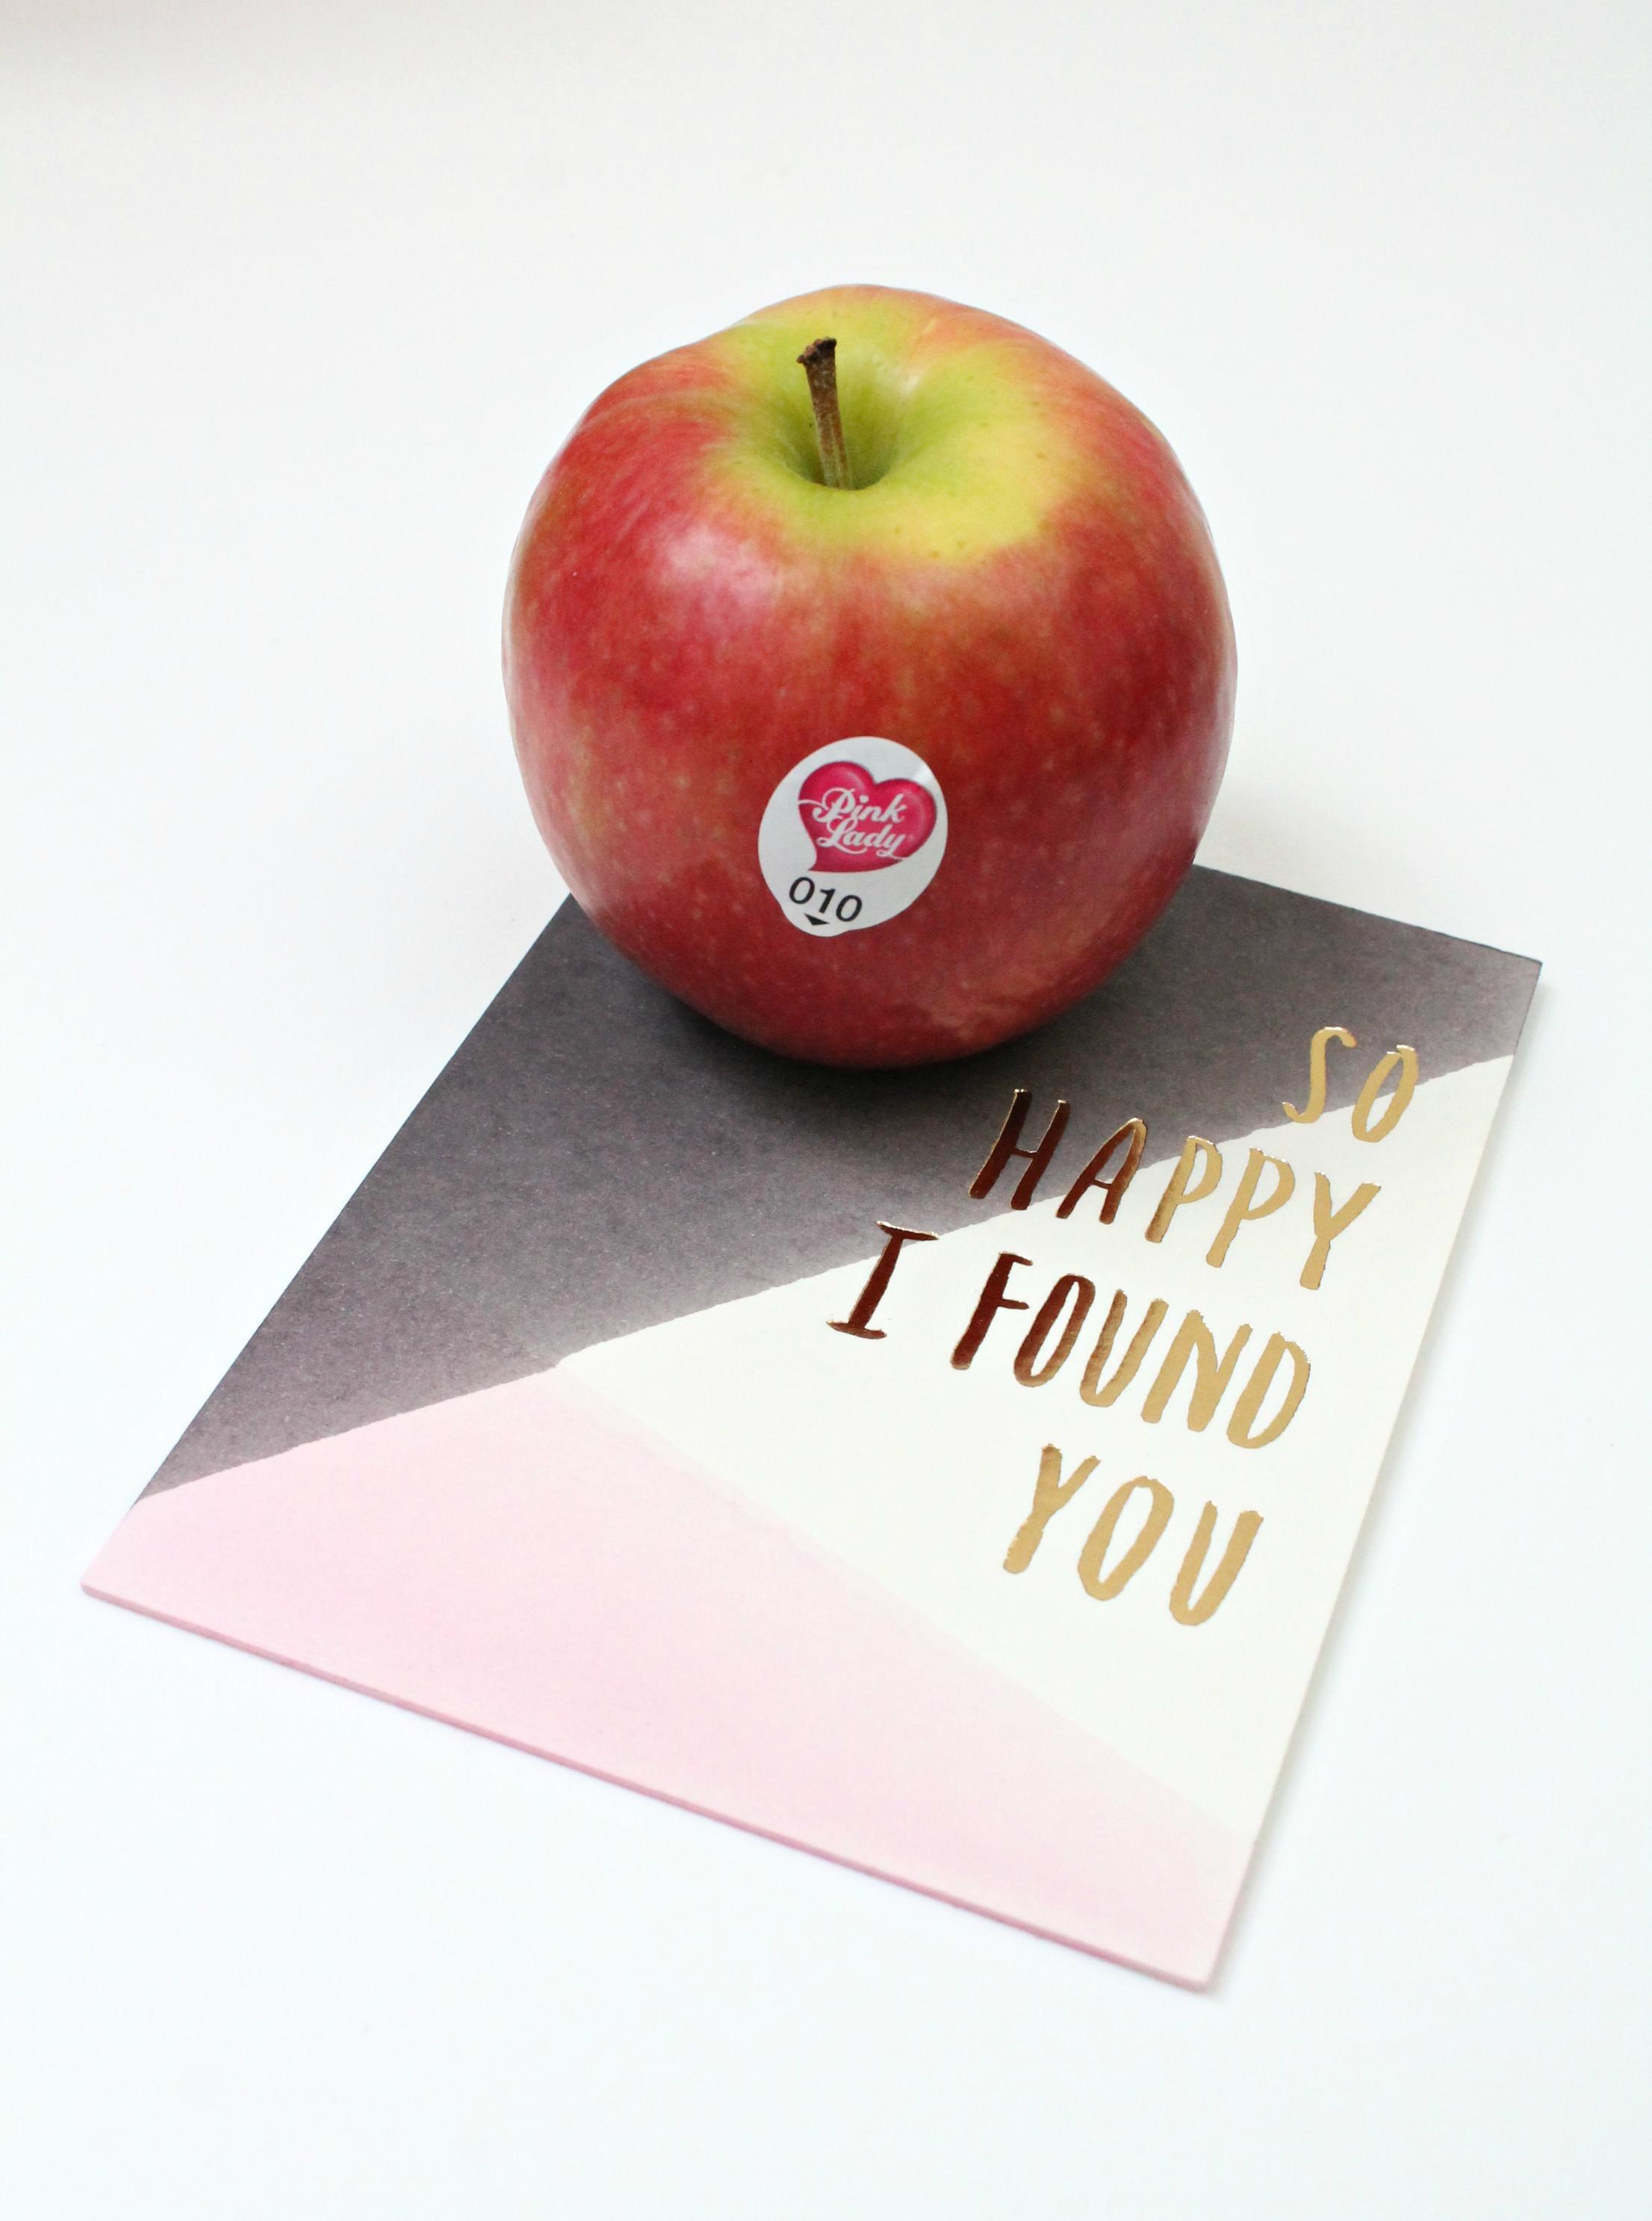 Pink-Lady-apple-photo-by-Geraldine-Tan